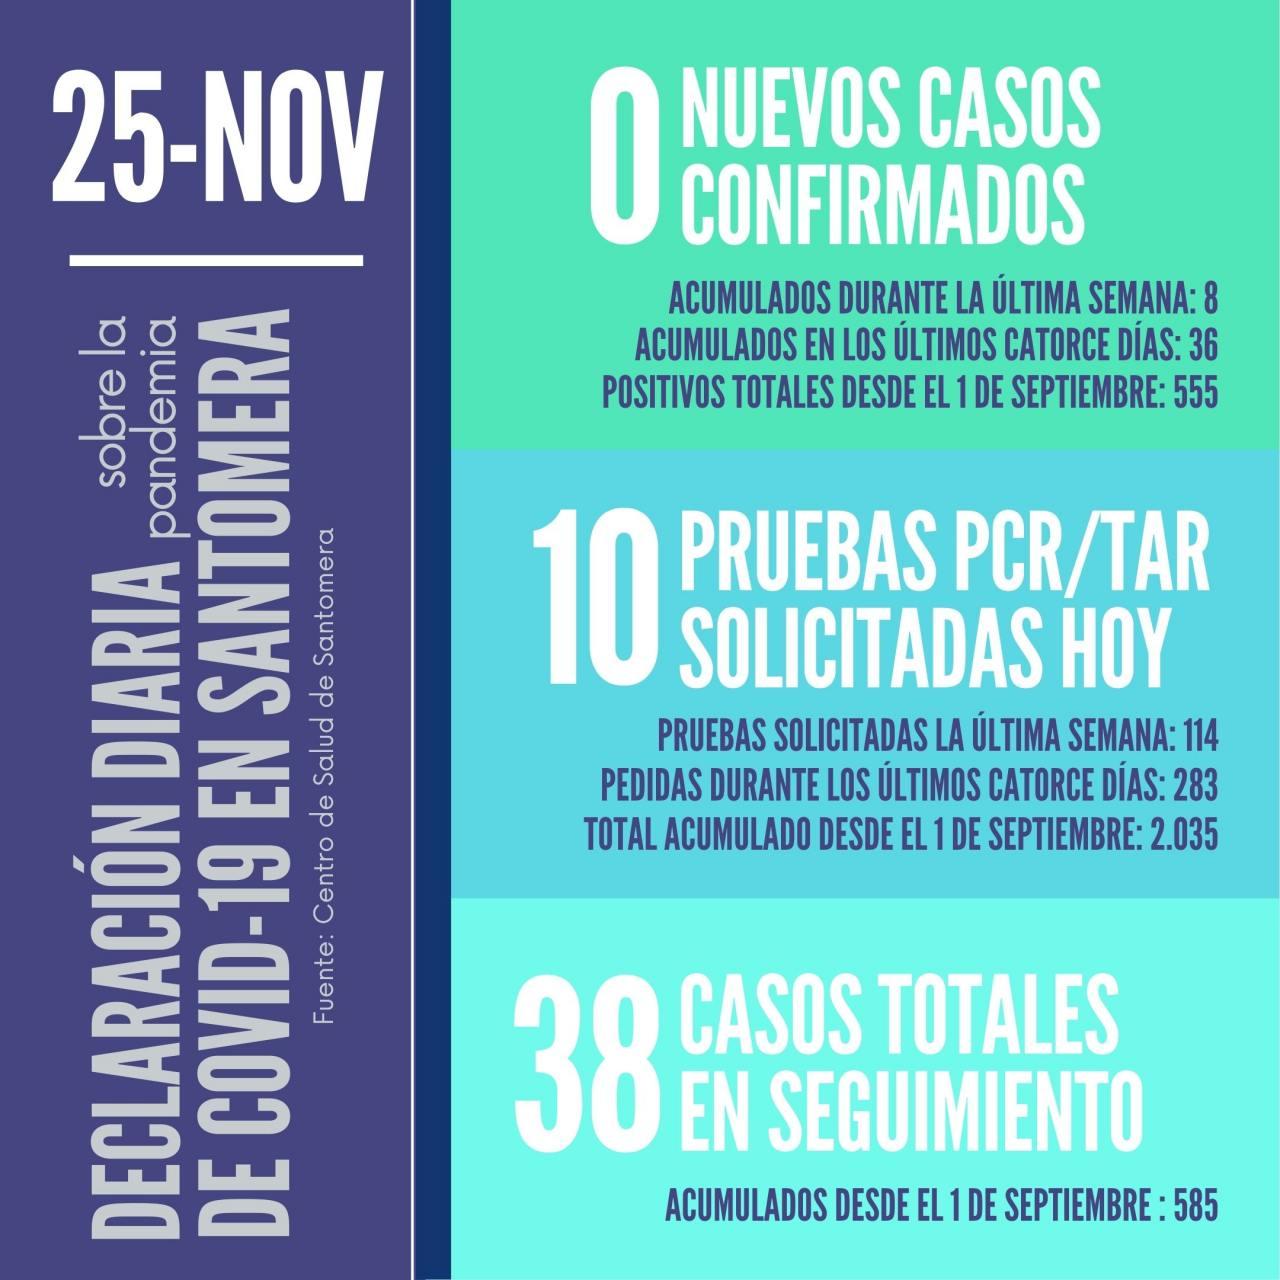 20201125_Datos-COVID-19-Santomera